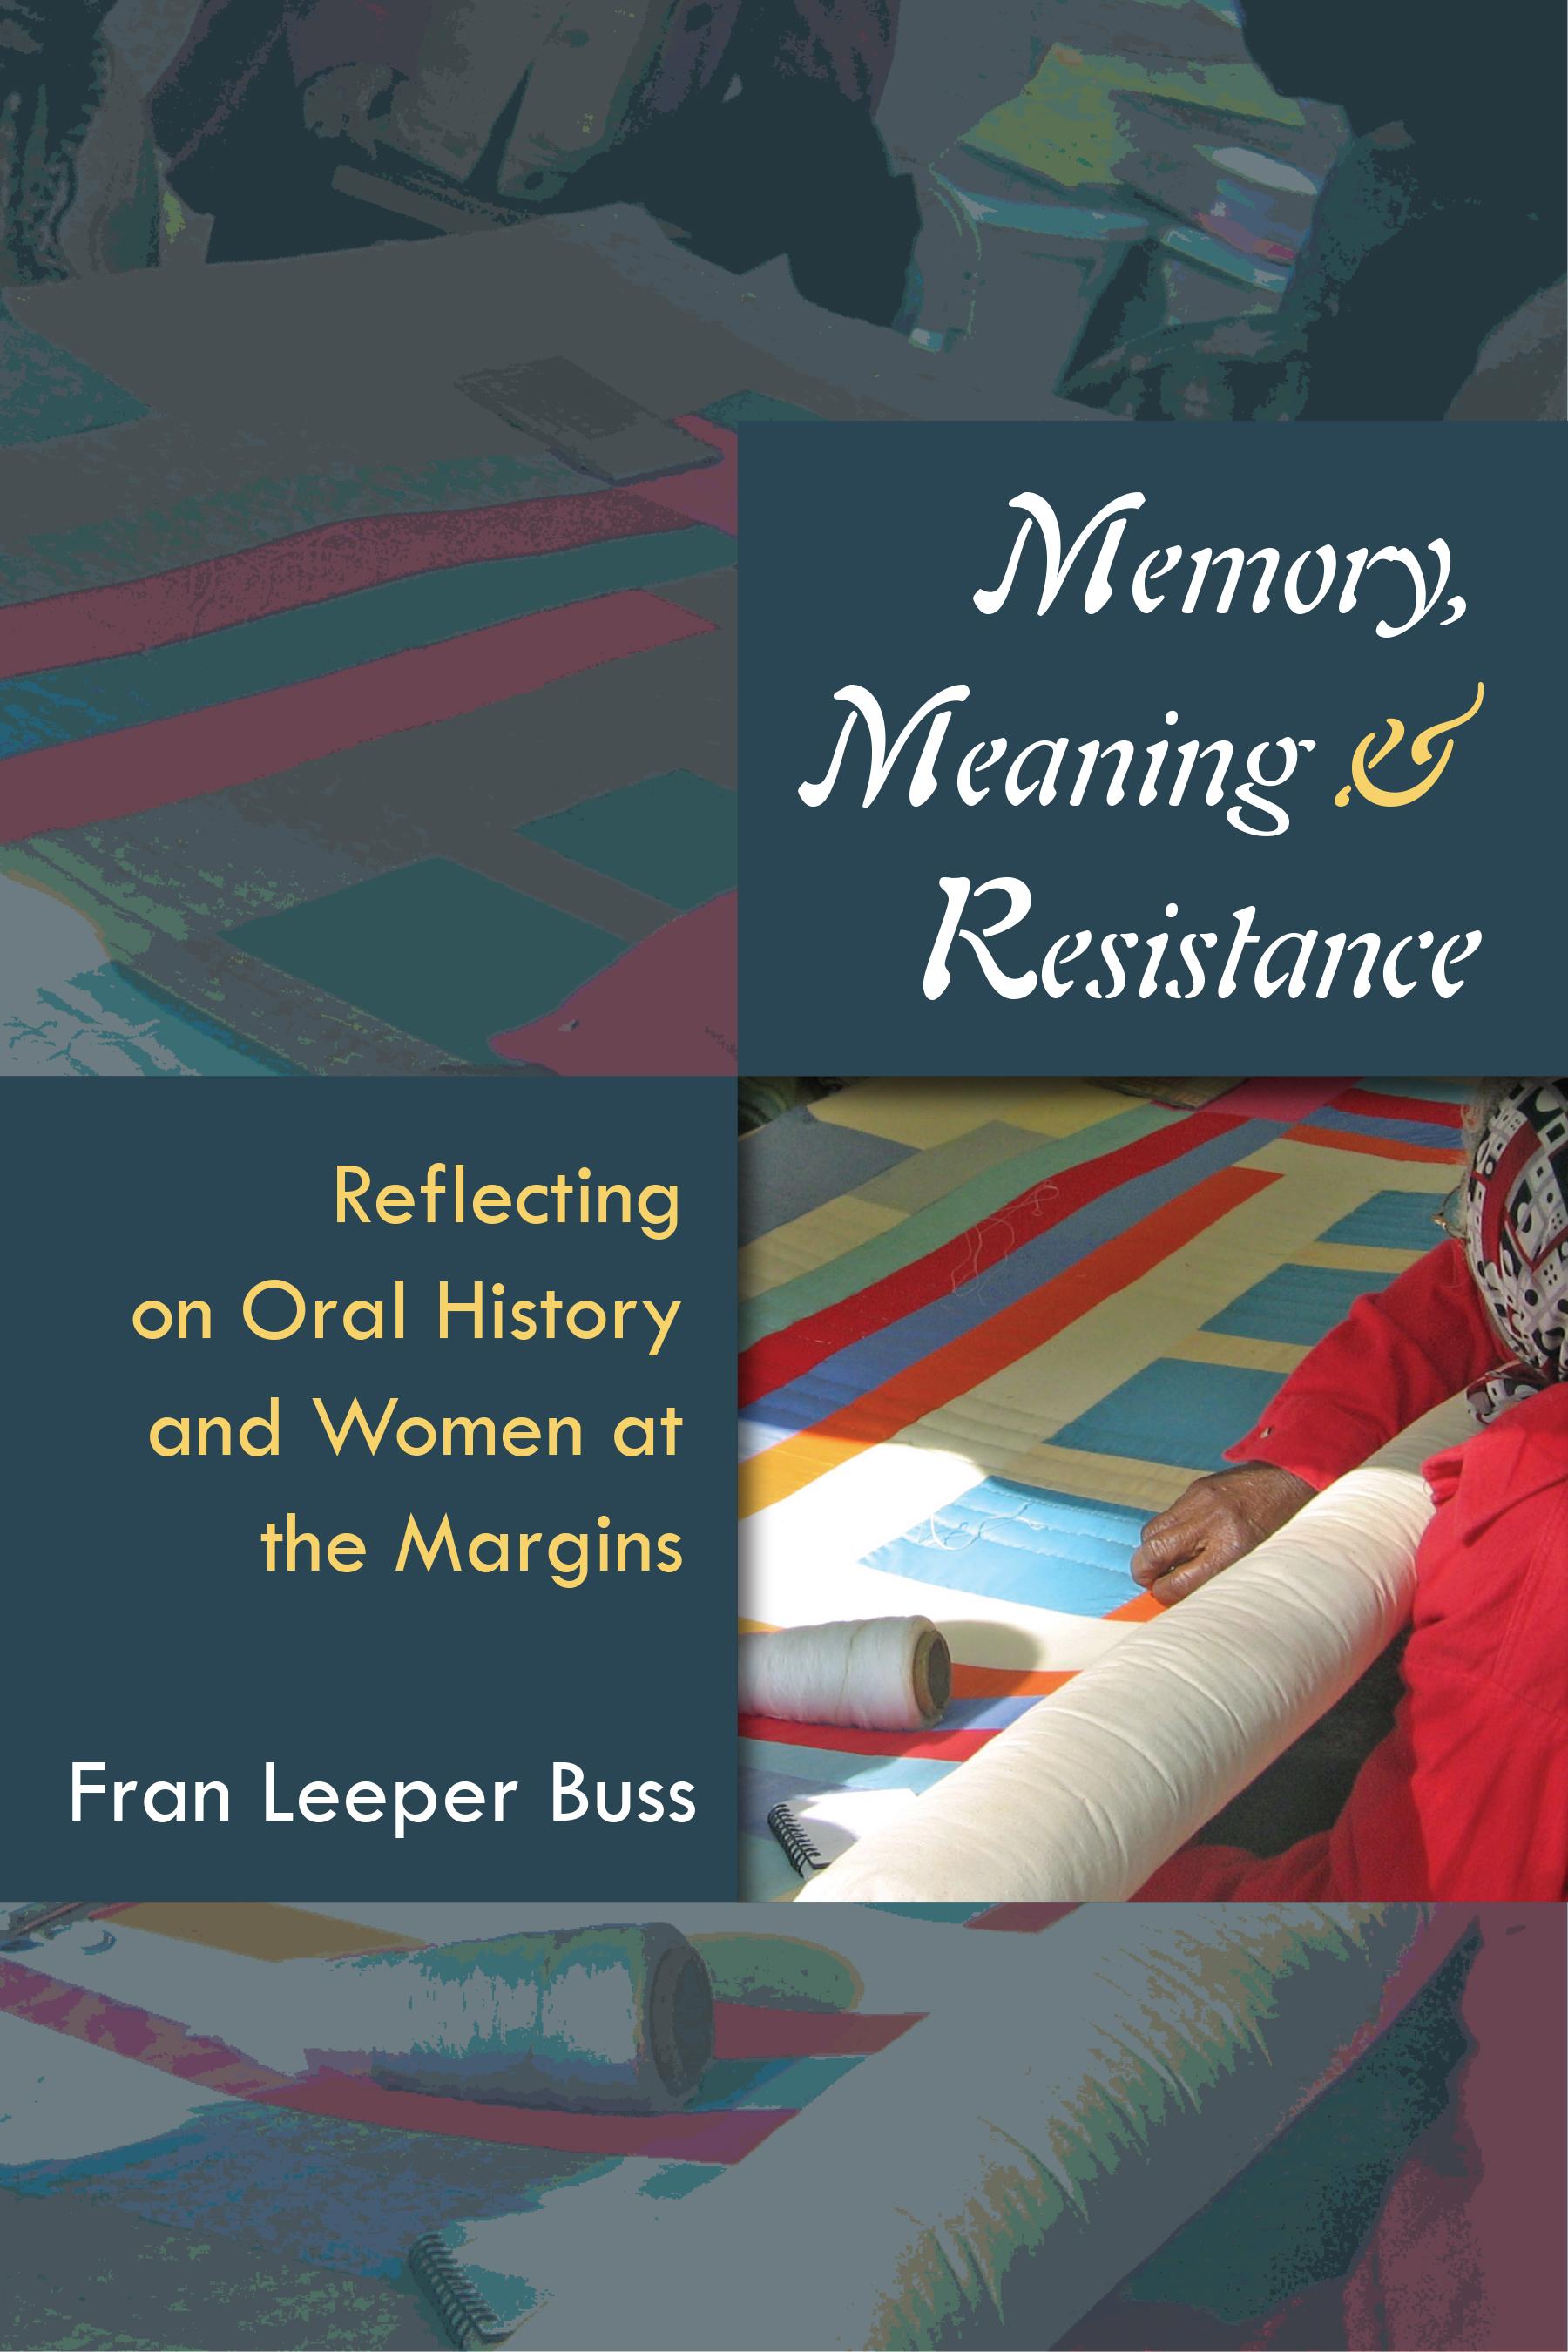 memory meaning resistance.jpg